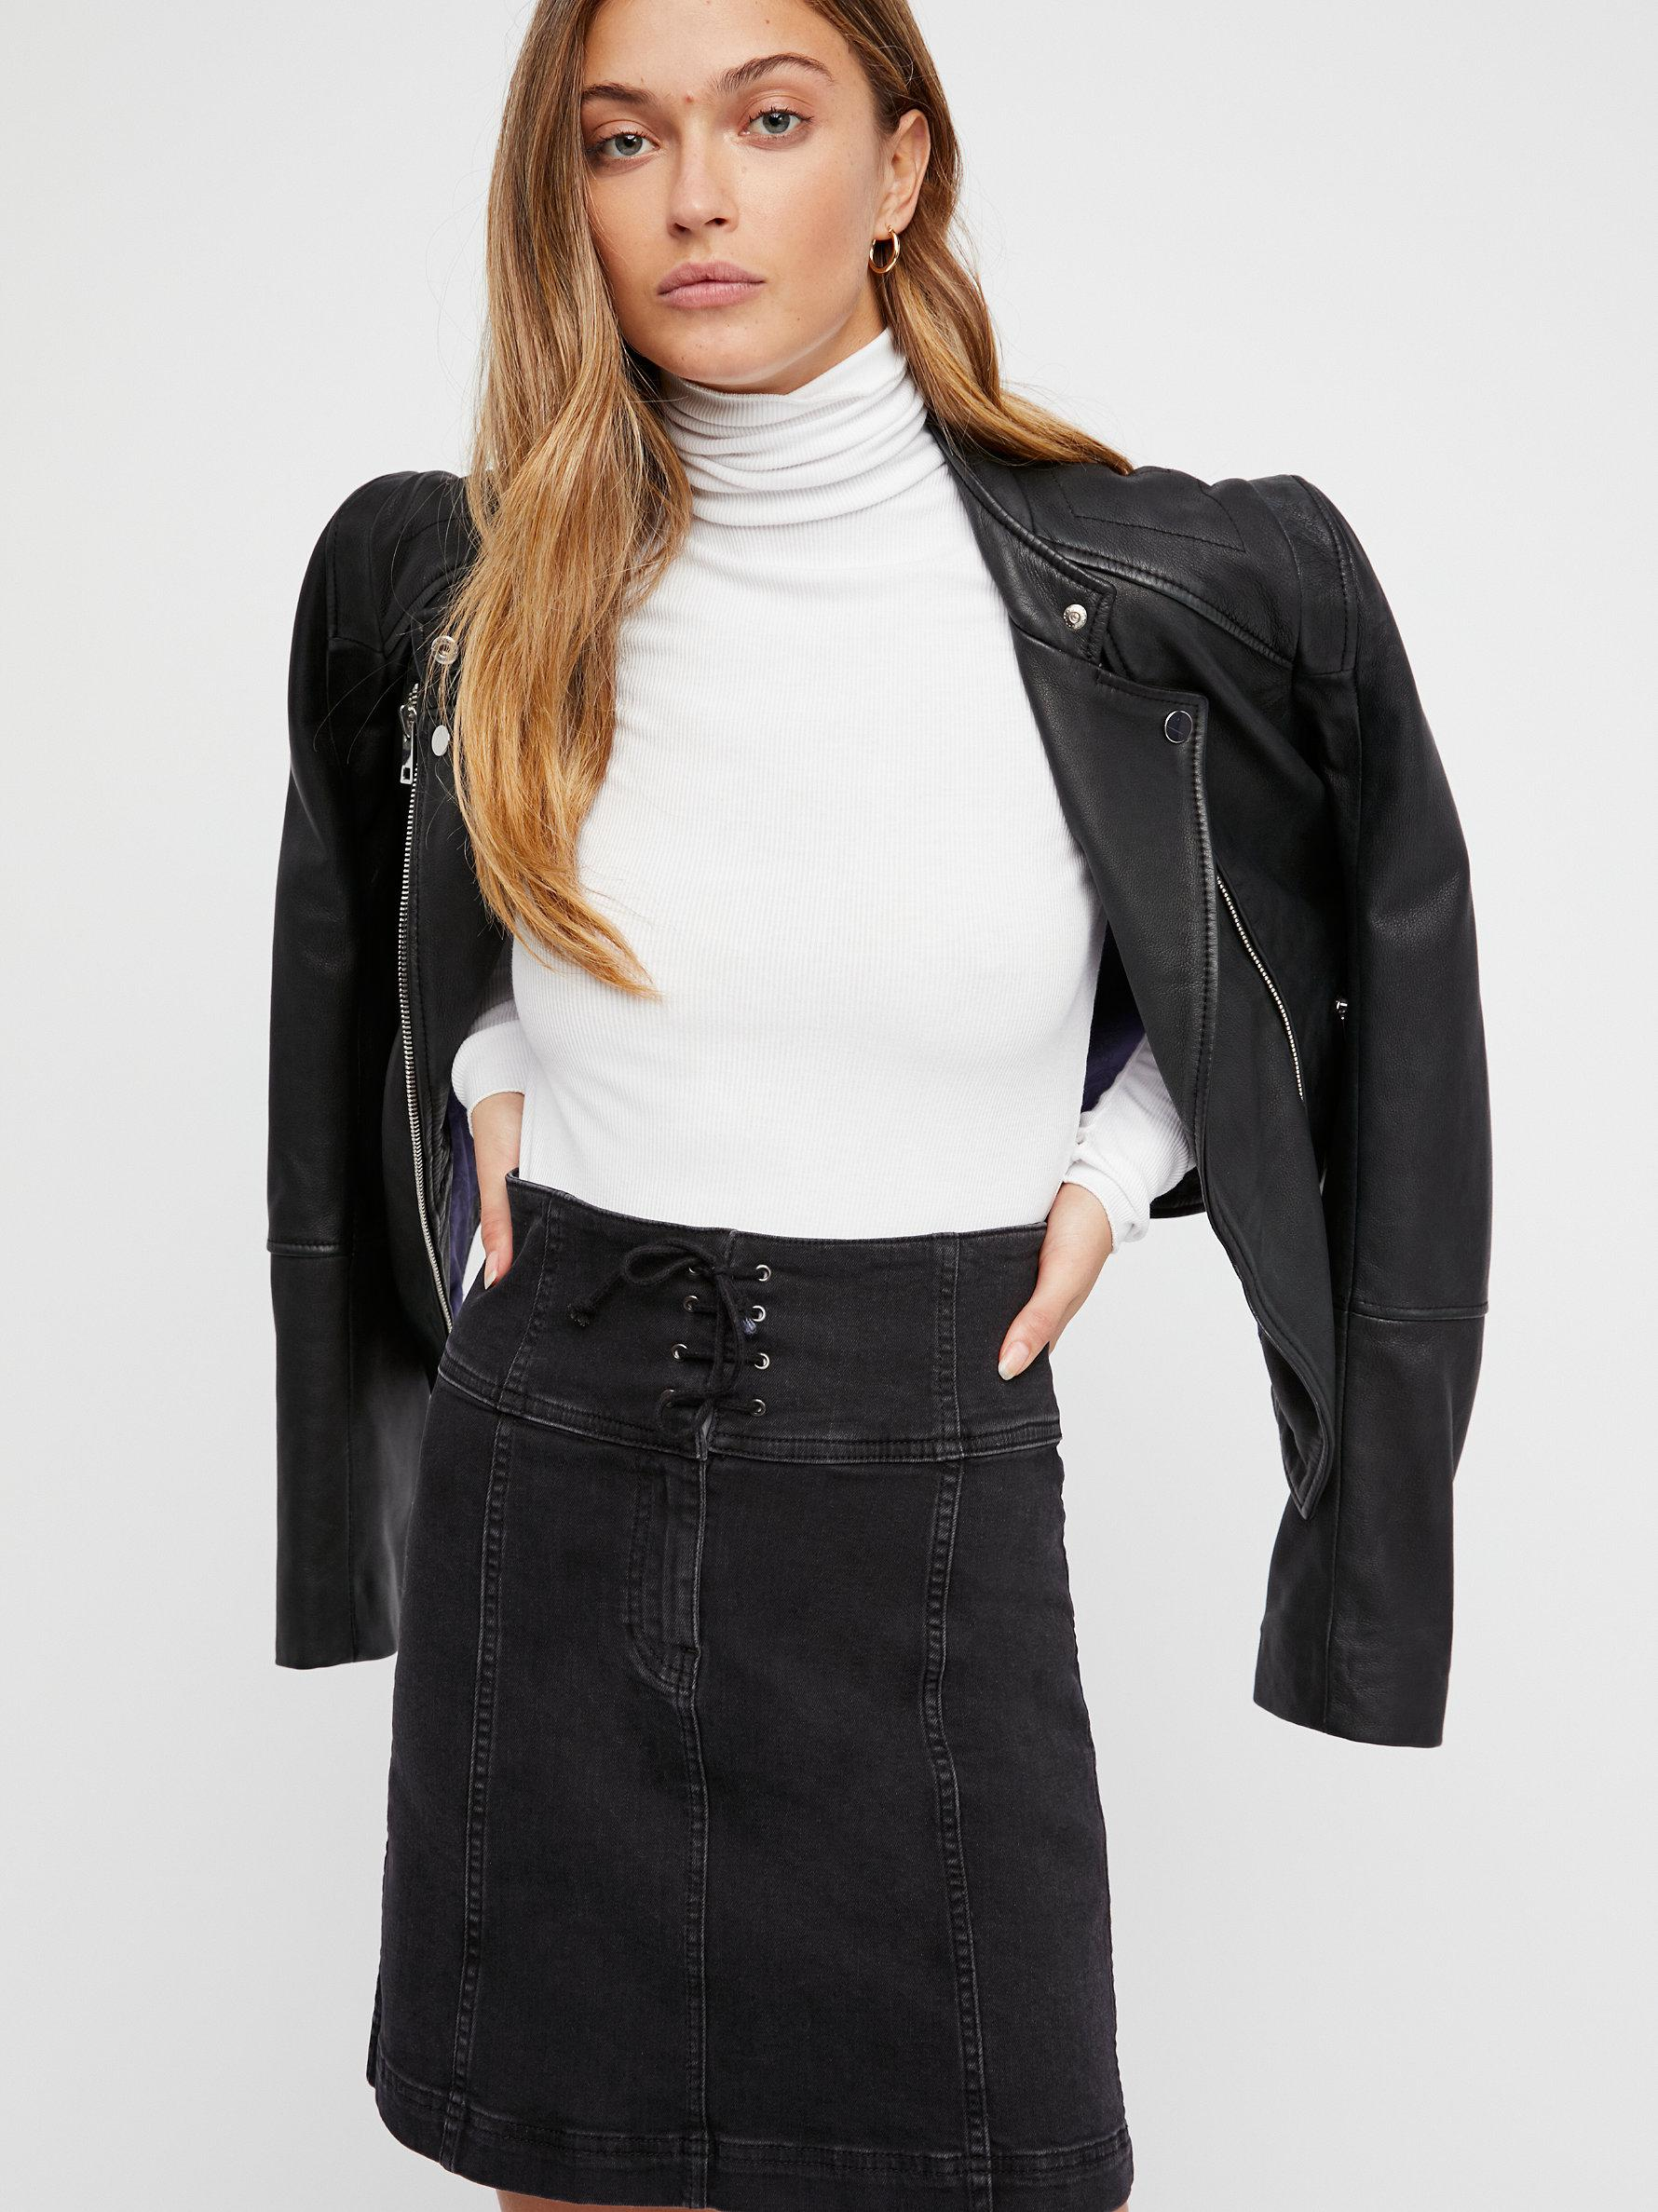 a49dddbcafe Free People Modern Femme Corset Mini Skirt in Black - Lyst